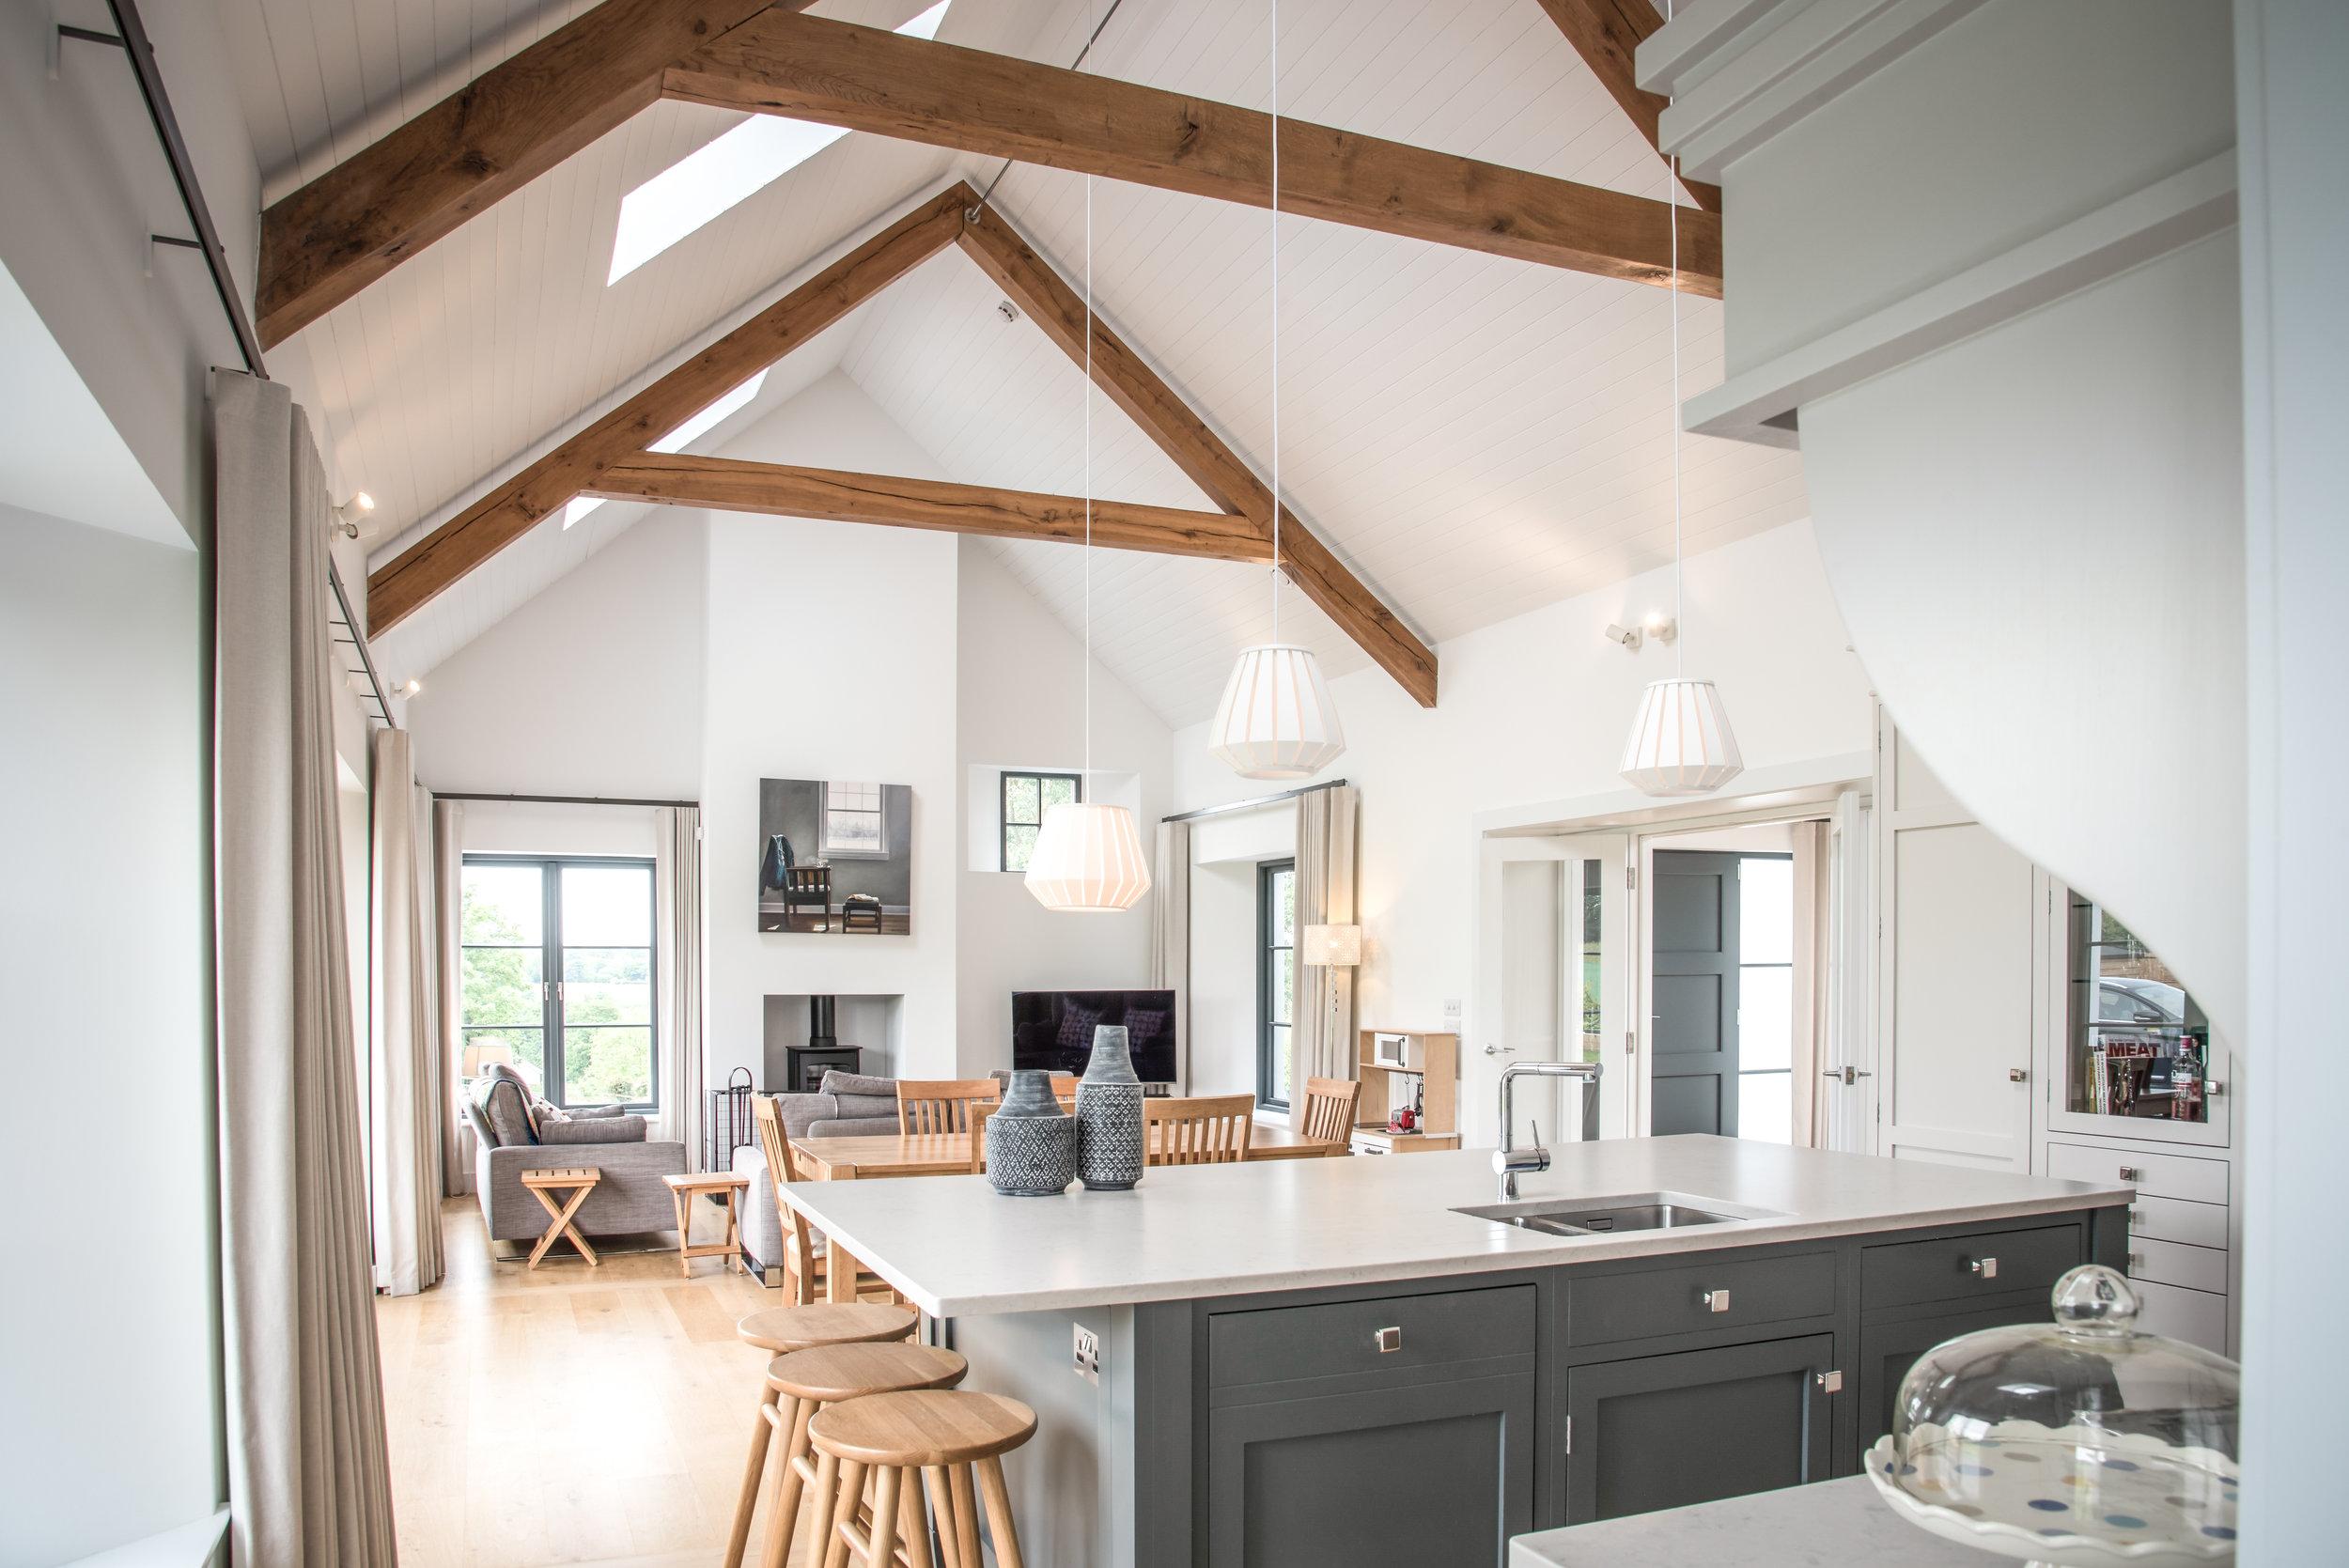 Paul_McAlister_Architects_kitchen_scene-1.jpg